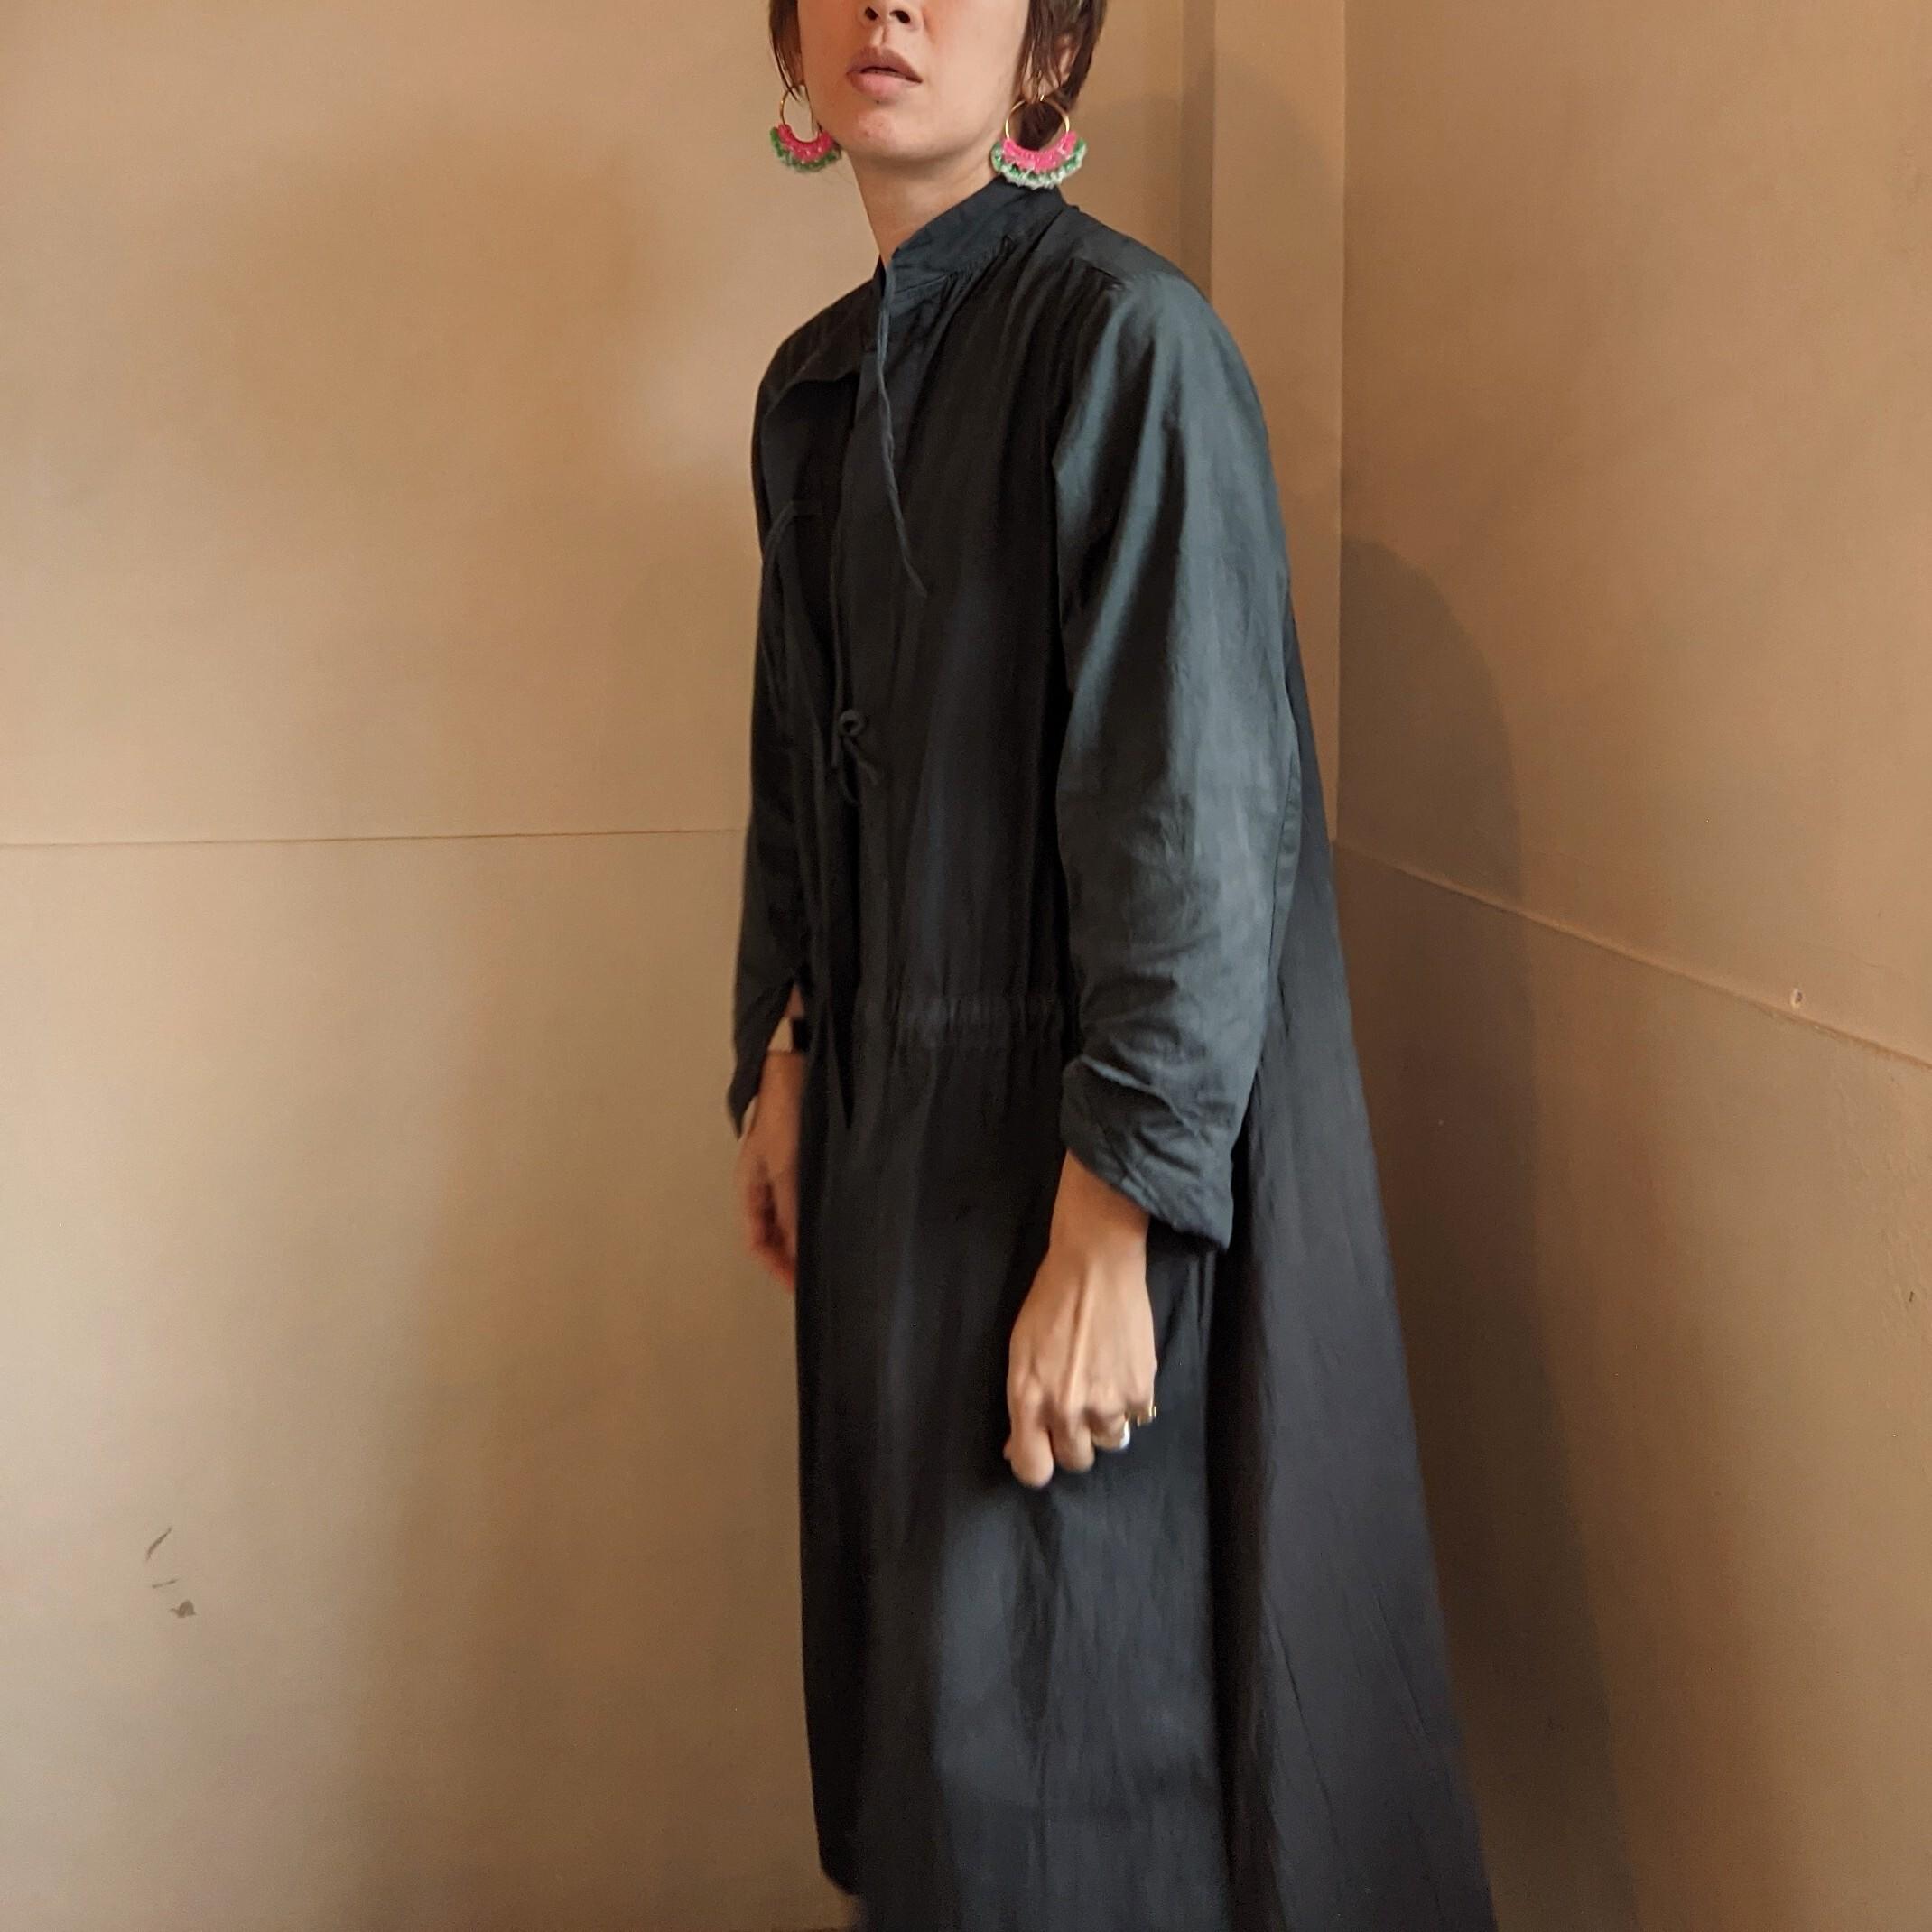 ☆ume limited color ☆【 REHERSALL 】リハーズオール / 2way medical dress gown / メディカルワンピースガウン / Black